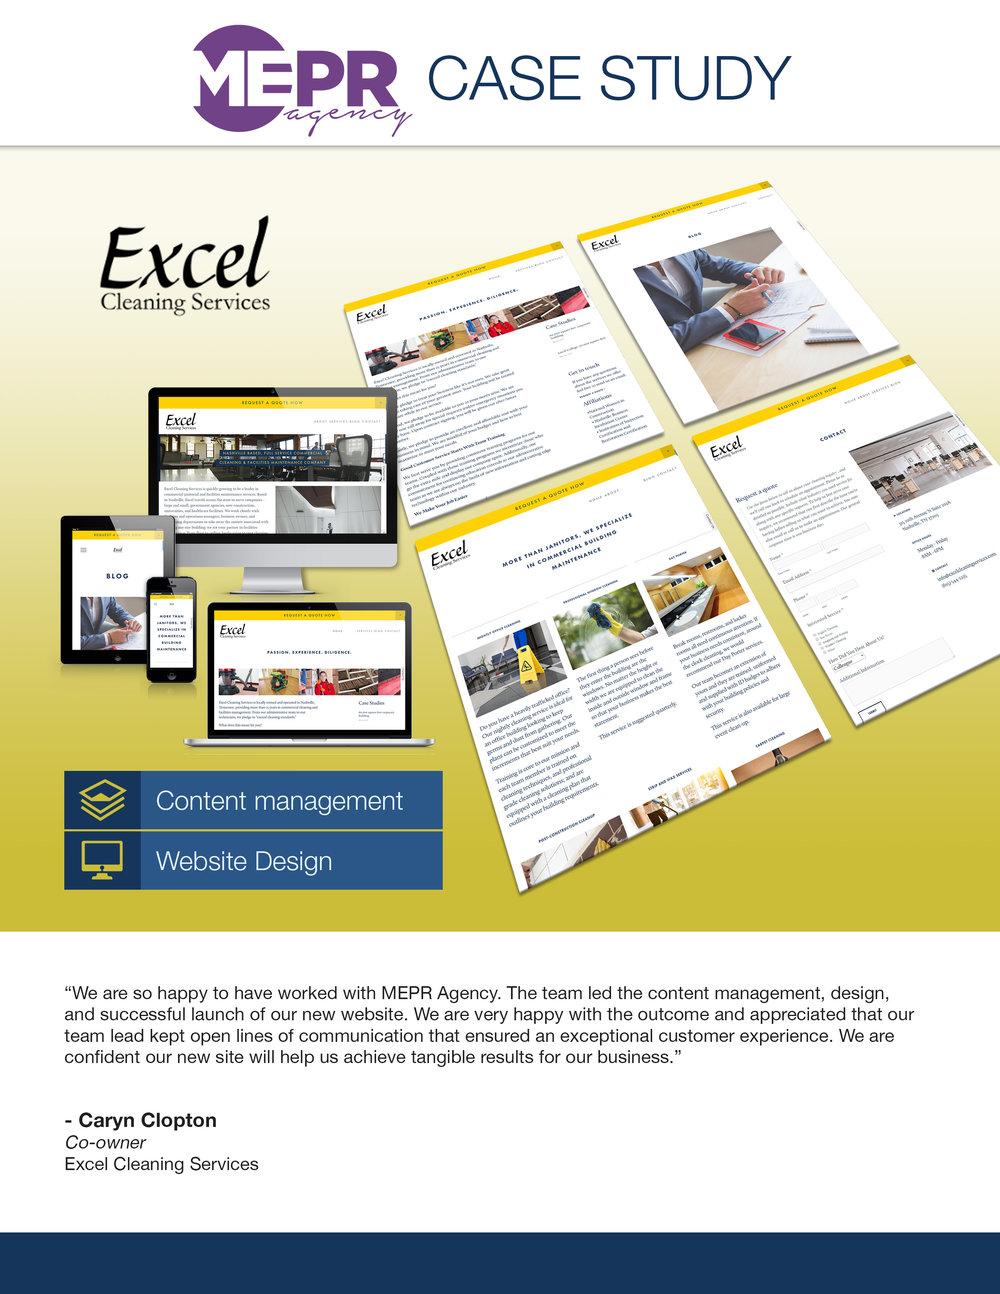 MEPR Excel CaseStudy.jpg